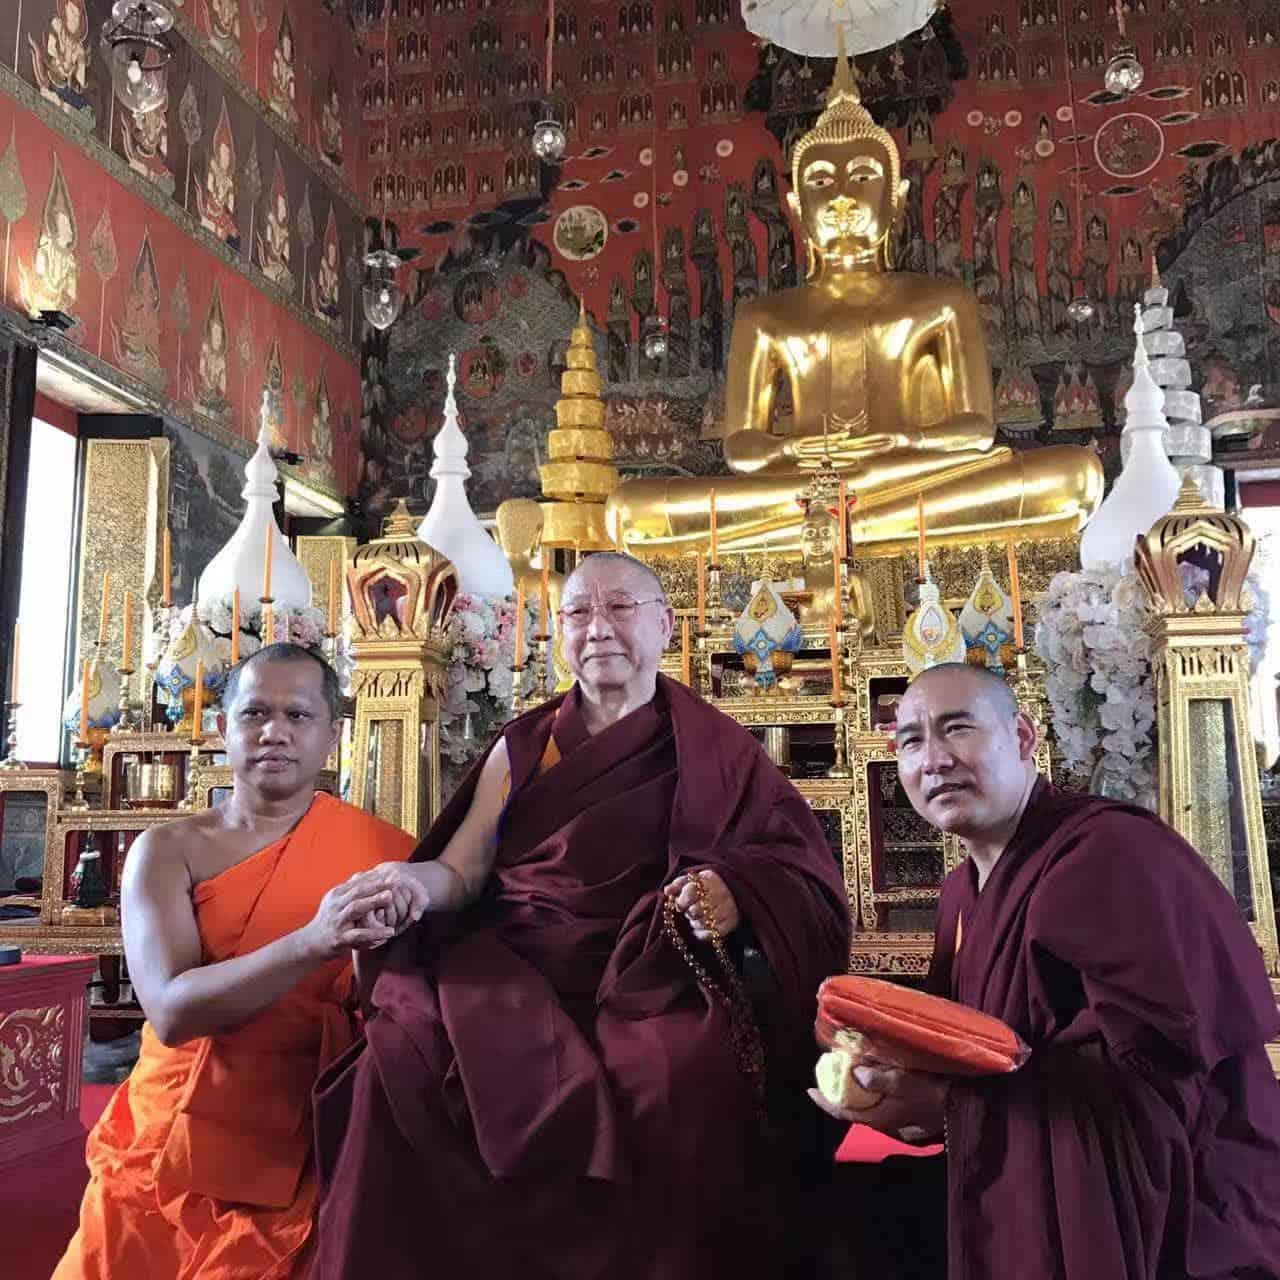 Gosok Rinpoche Thailand 2017 T015 b71be573d0d1b6a137a05bdc399a5b3